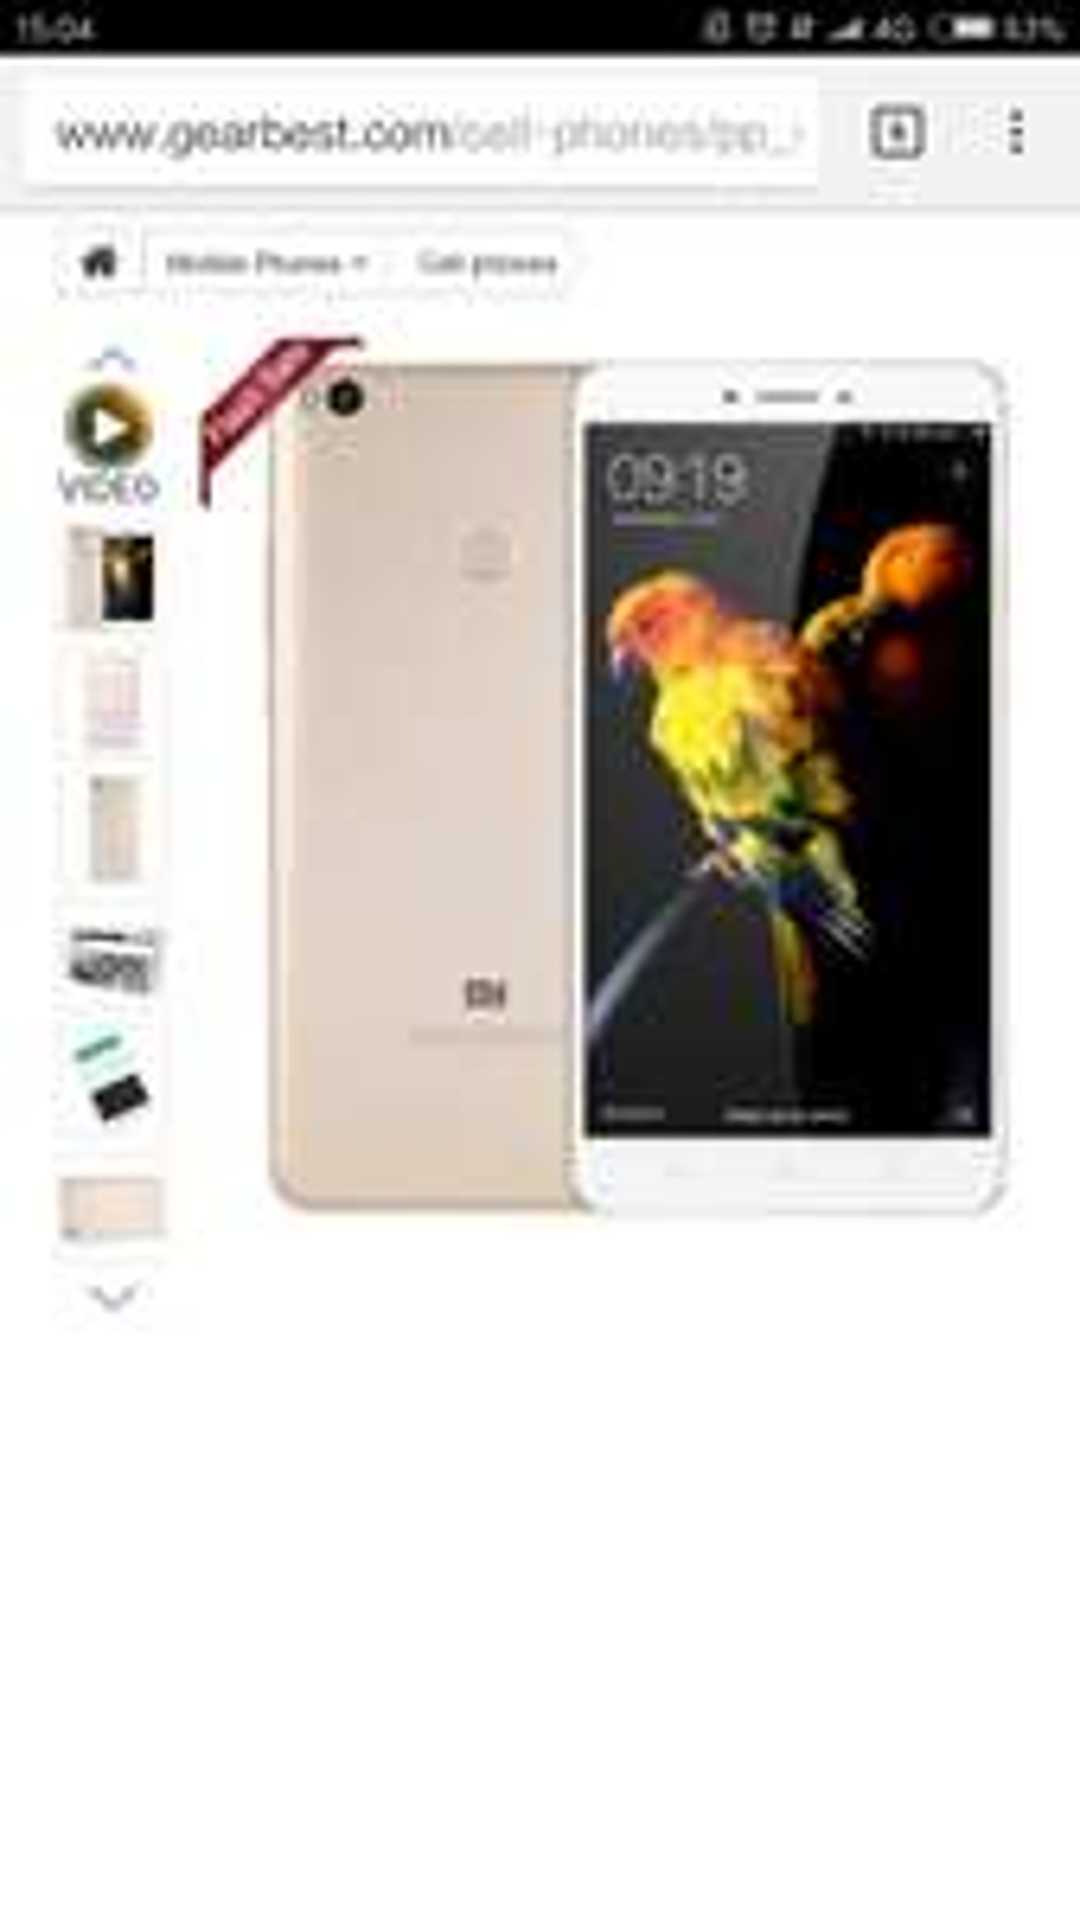 XiaoMi MI Max 2, 6.44 inch 4G ram and 64 rom £206.43 @ Gearbest